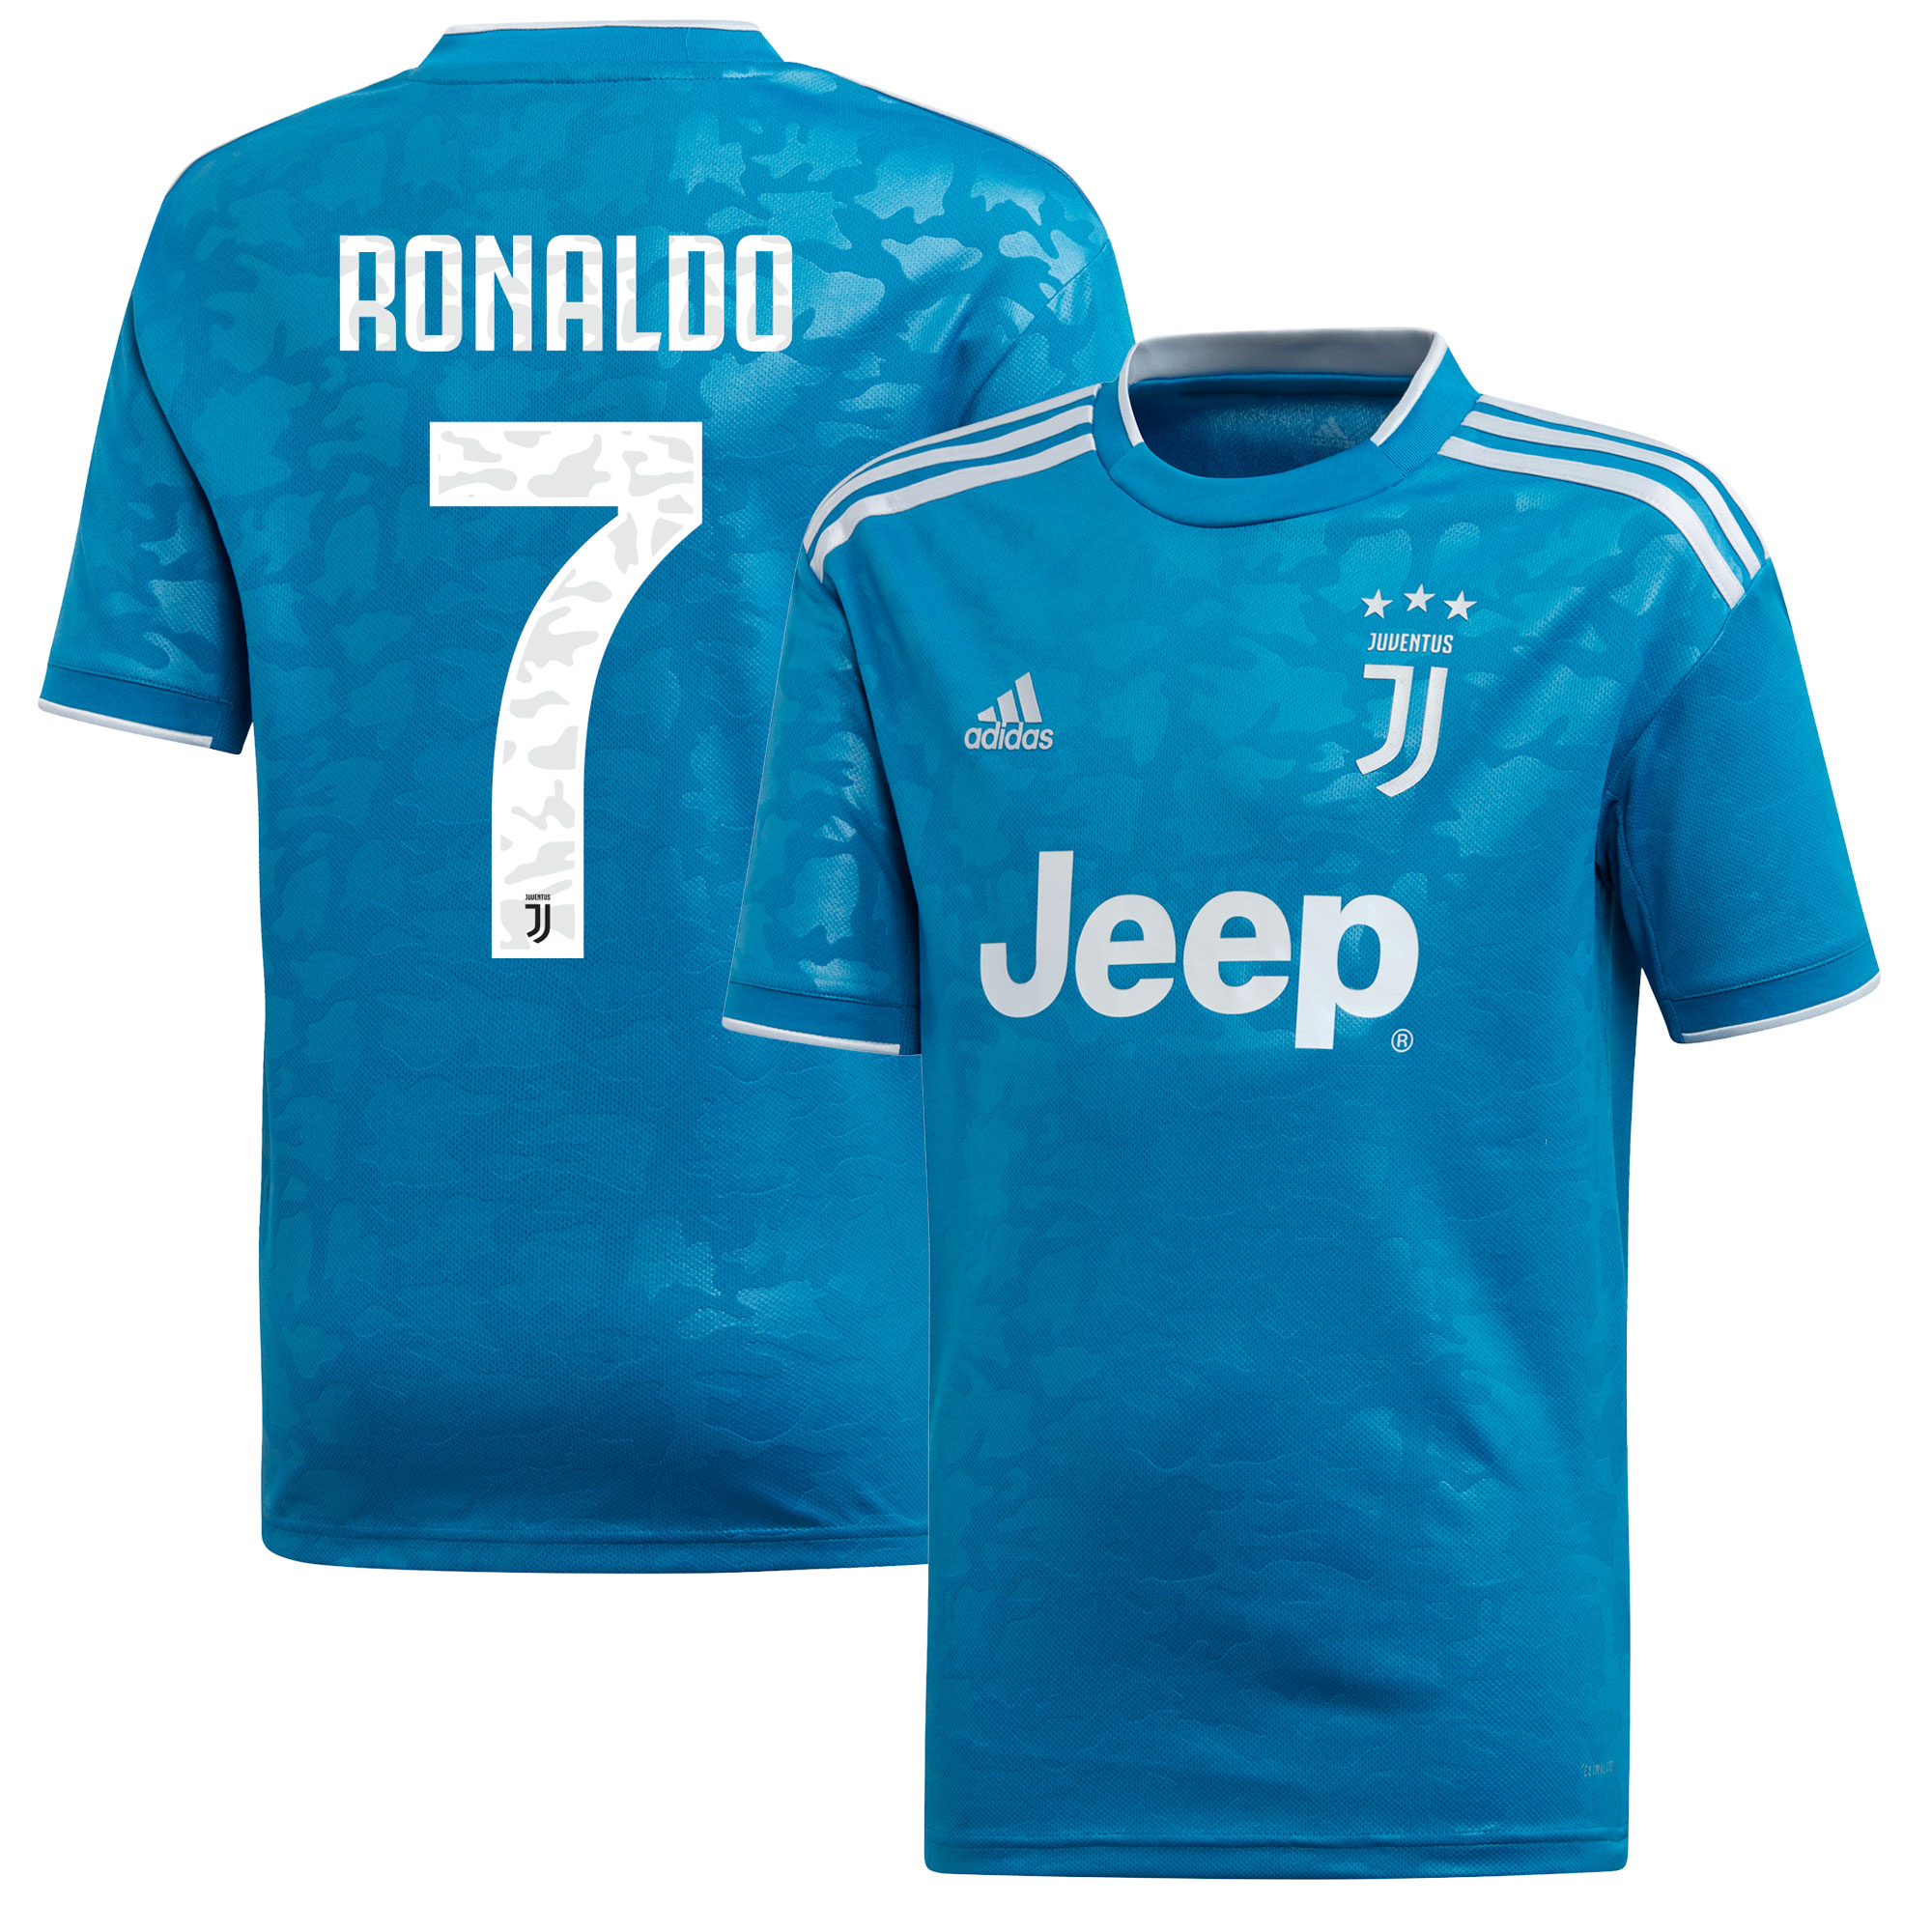 adidas Juventus 3rd Ronaldo 7 Shirt 2019-2020